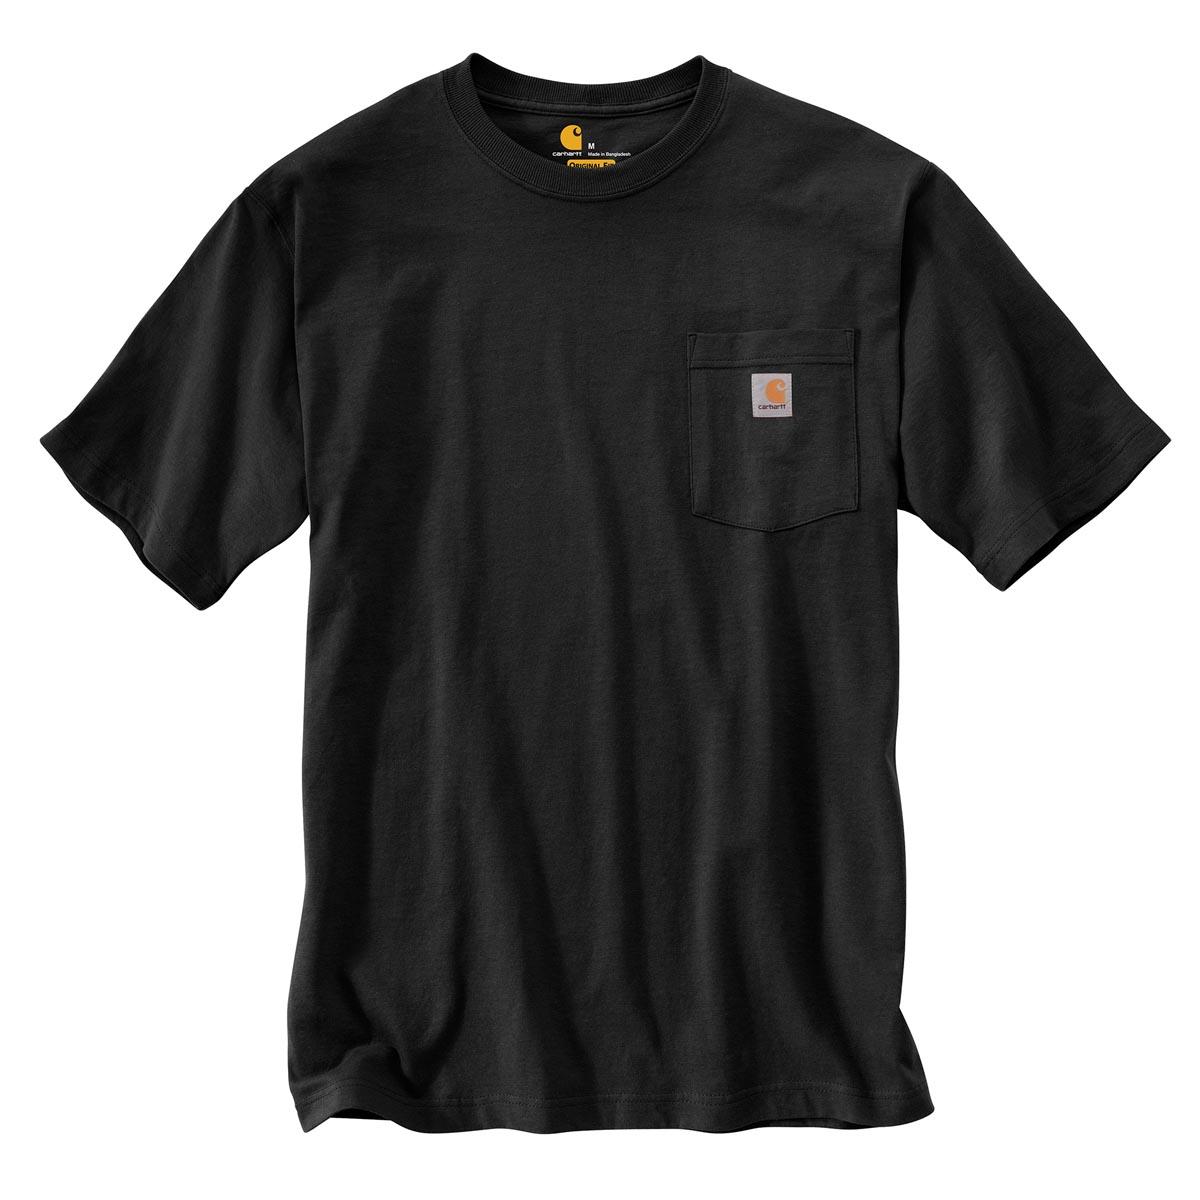 Carhartt Men's Workwear Logo Fish Graphic Pocket Short Sleeve T-Shirt